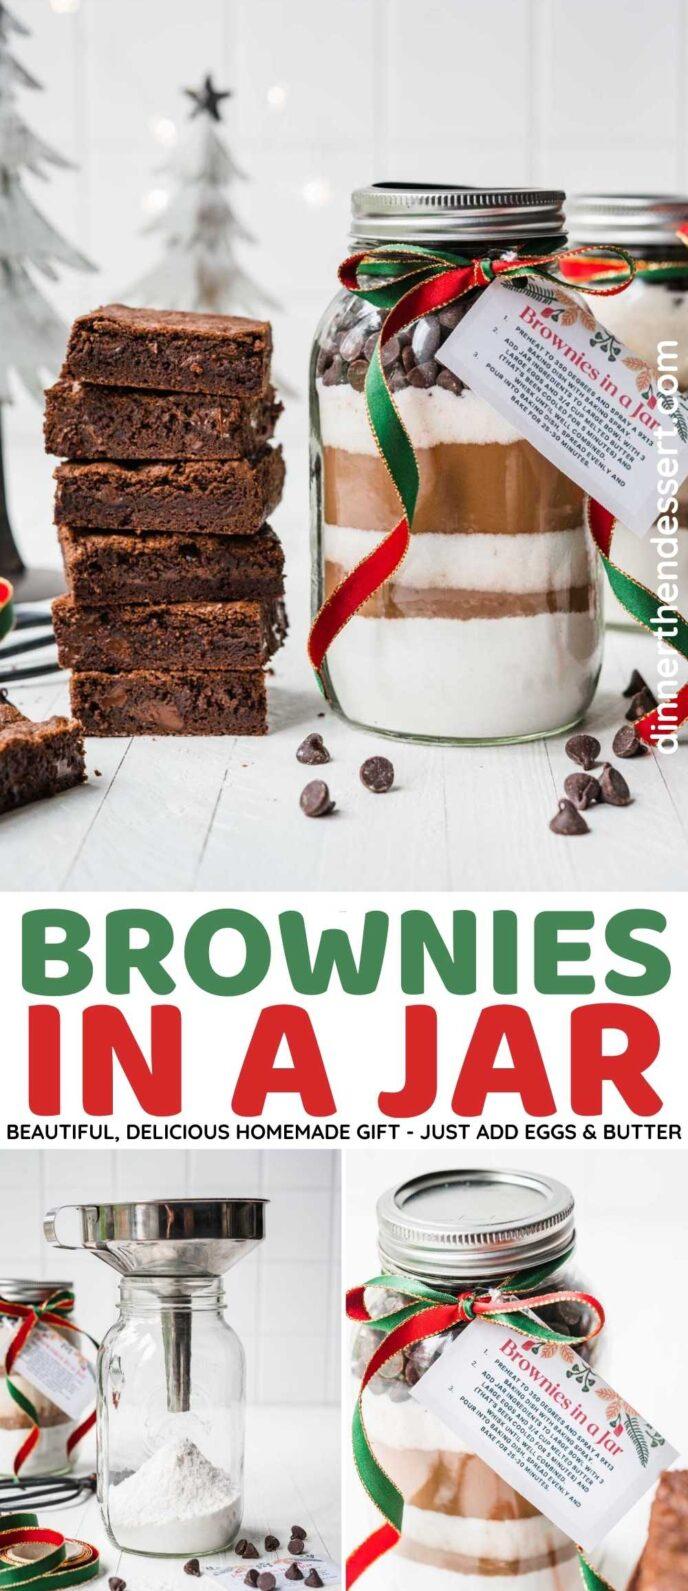 Brownies in a Jar Collage